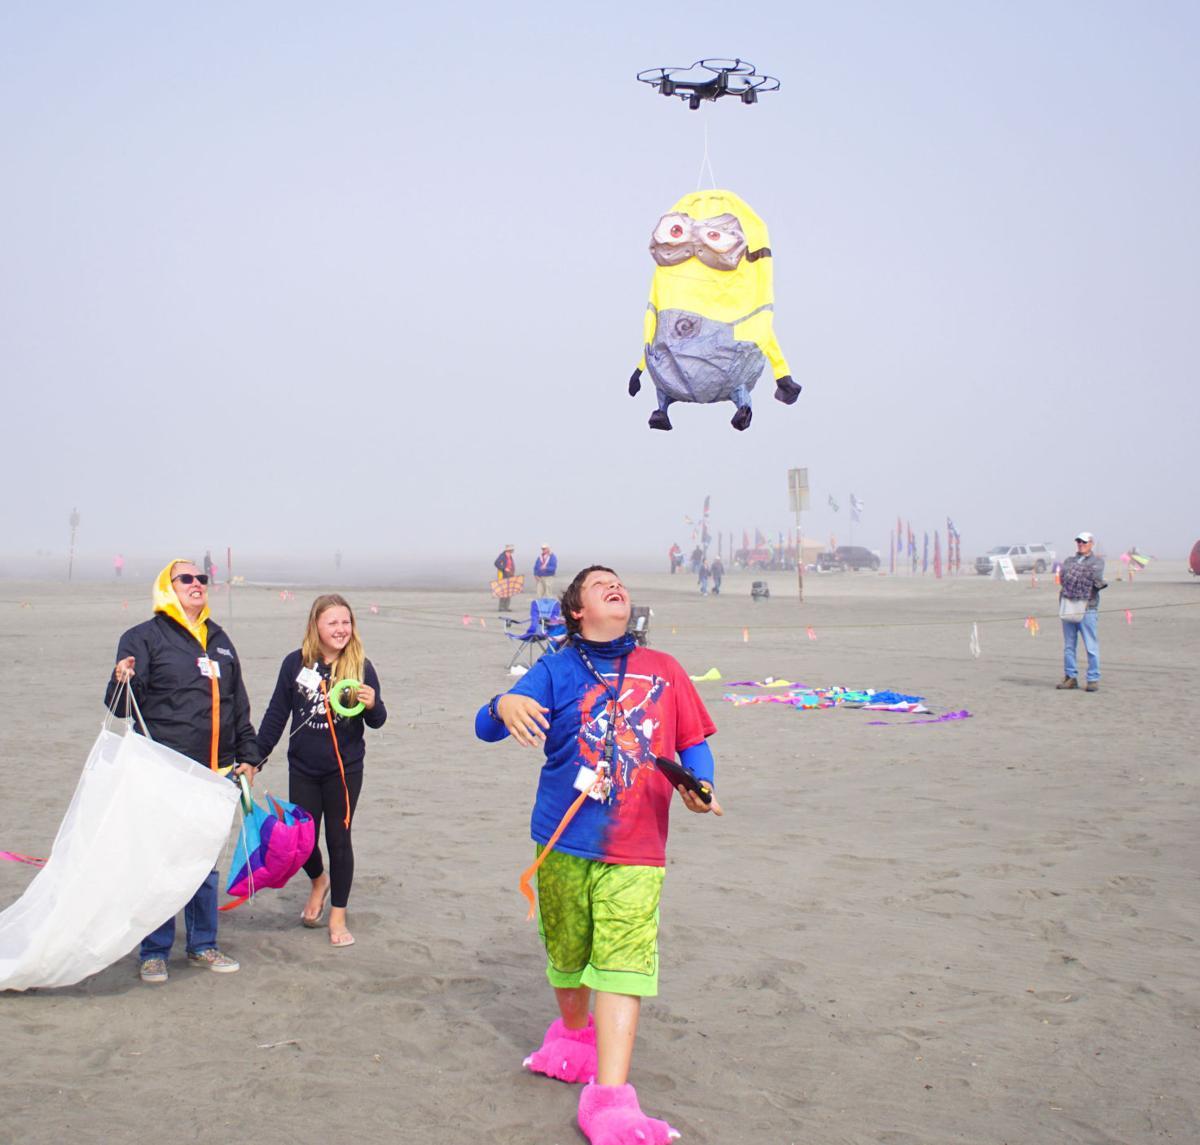 Kite festival has a calm day